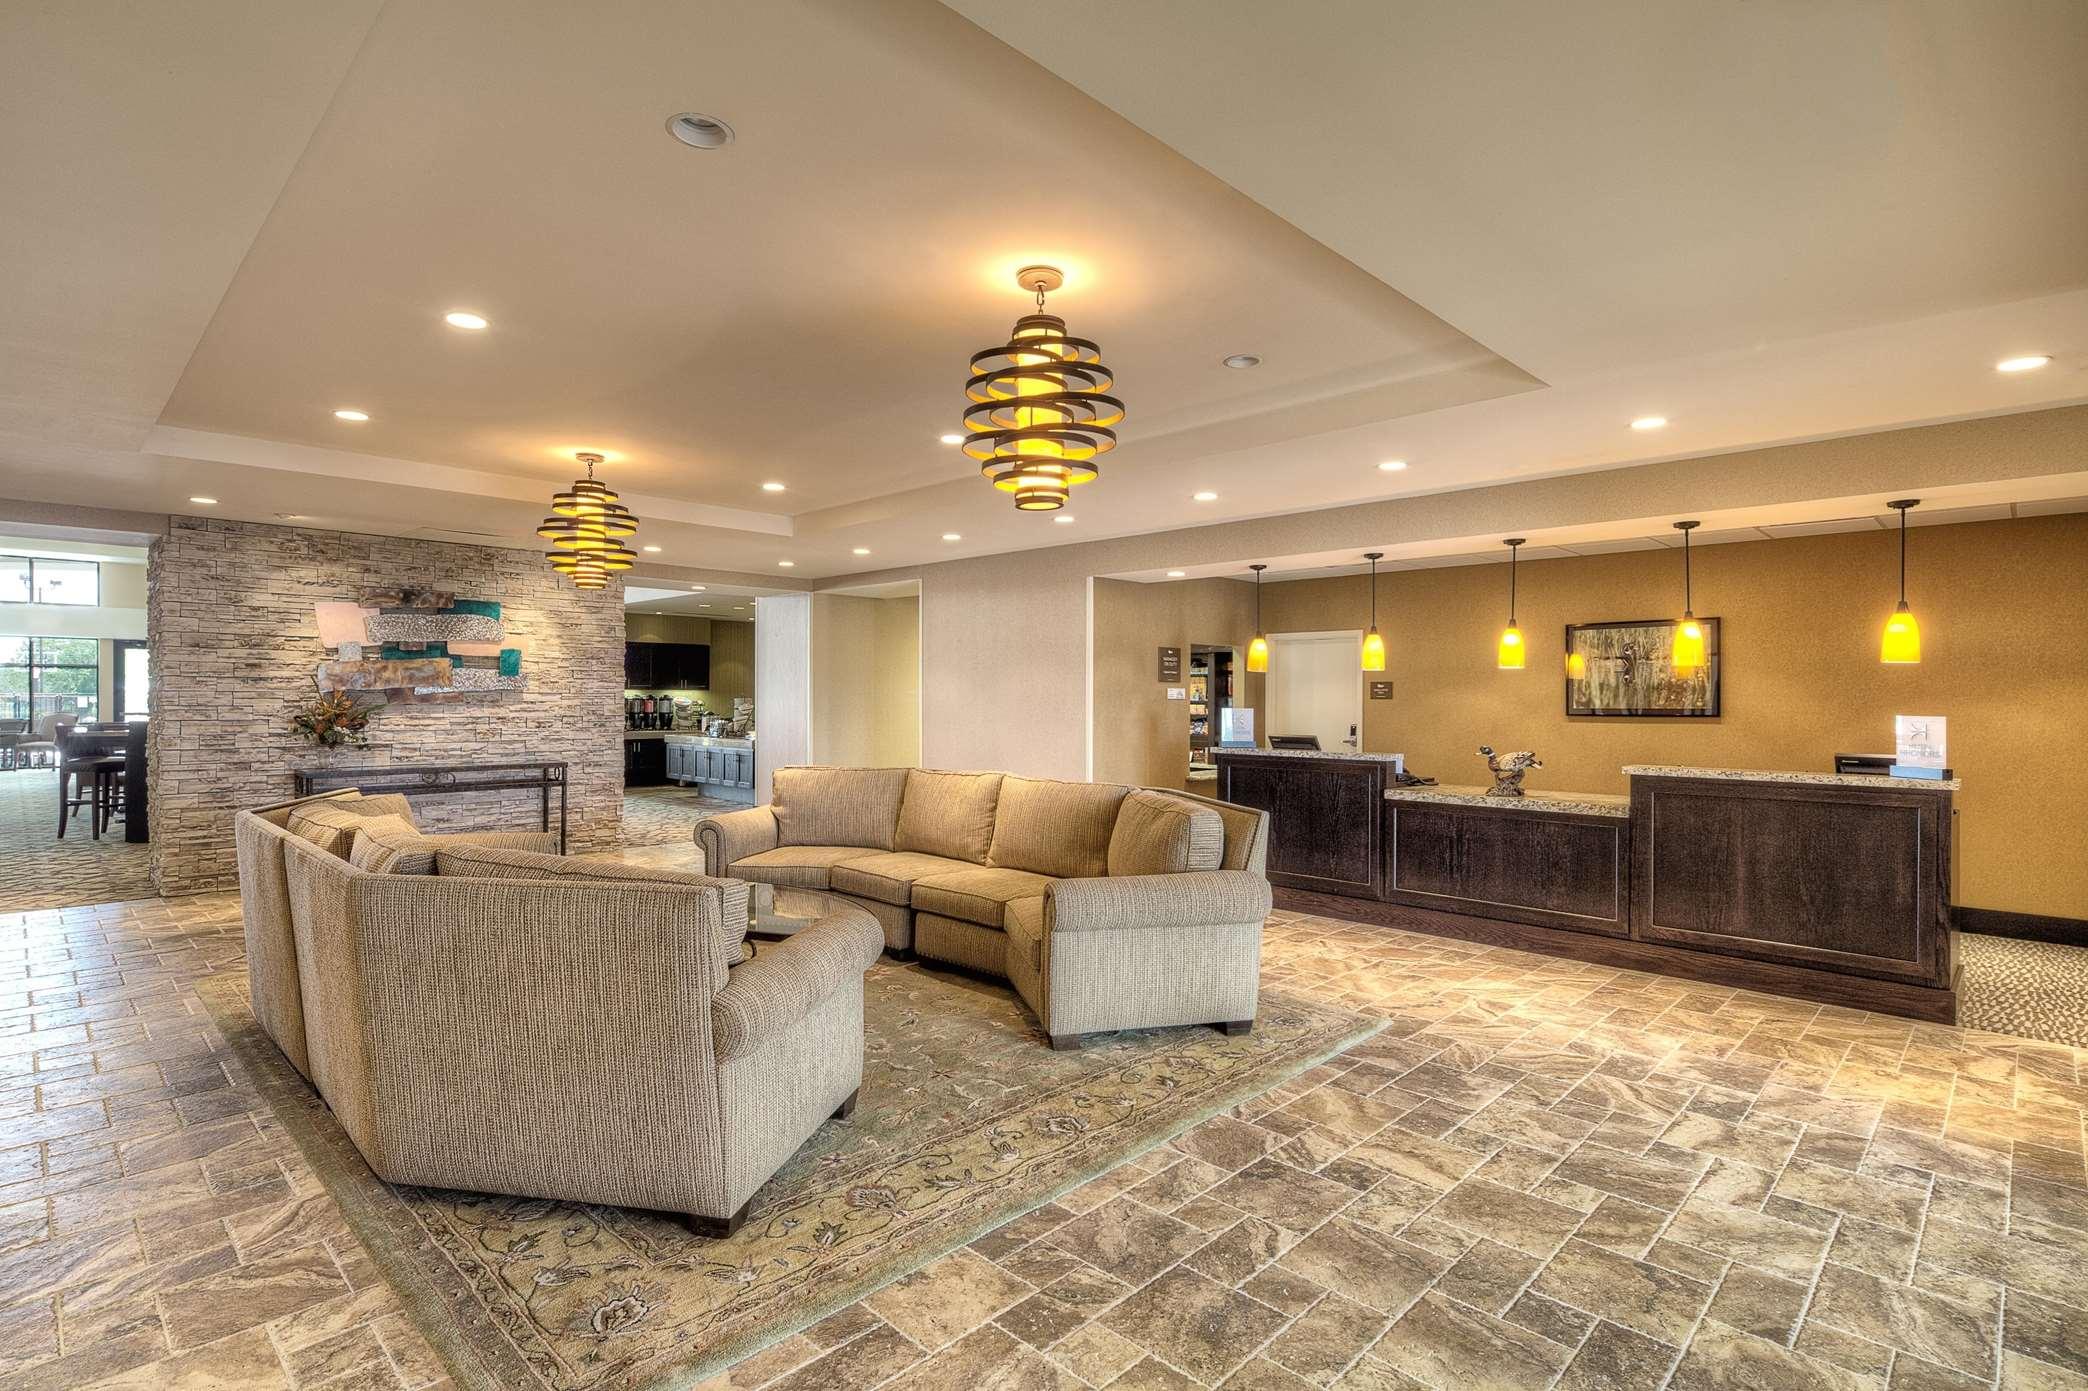 Homewood Suites by Hilton Victoria, TX image 21